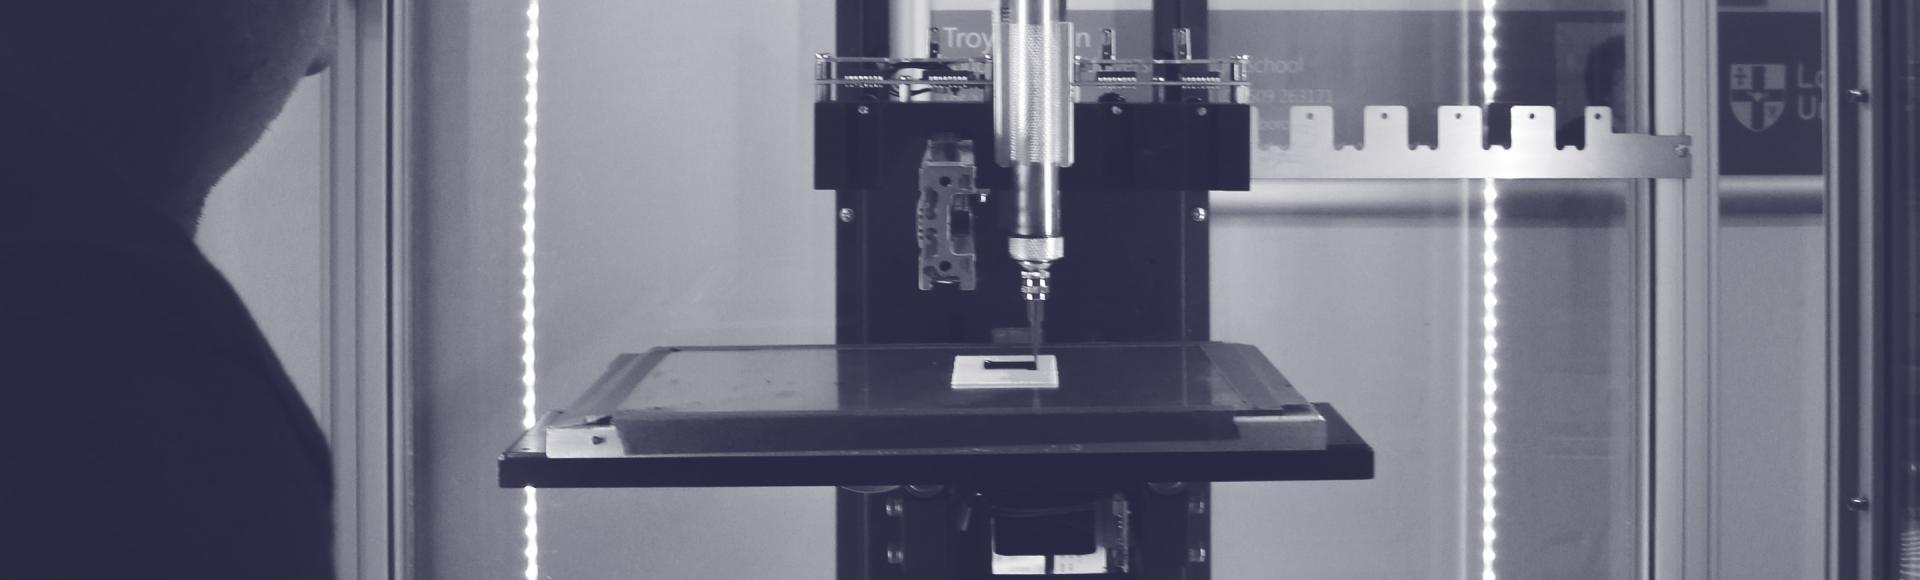 ARK-Invest_Blog-Banner_2016_07_22---3D-Printing-Industry